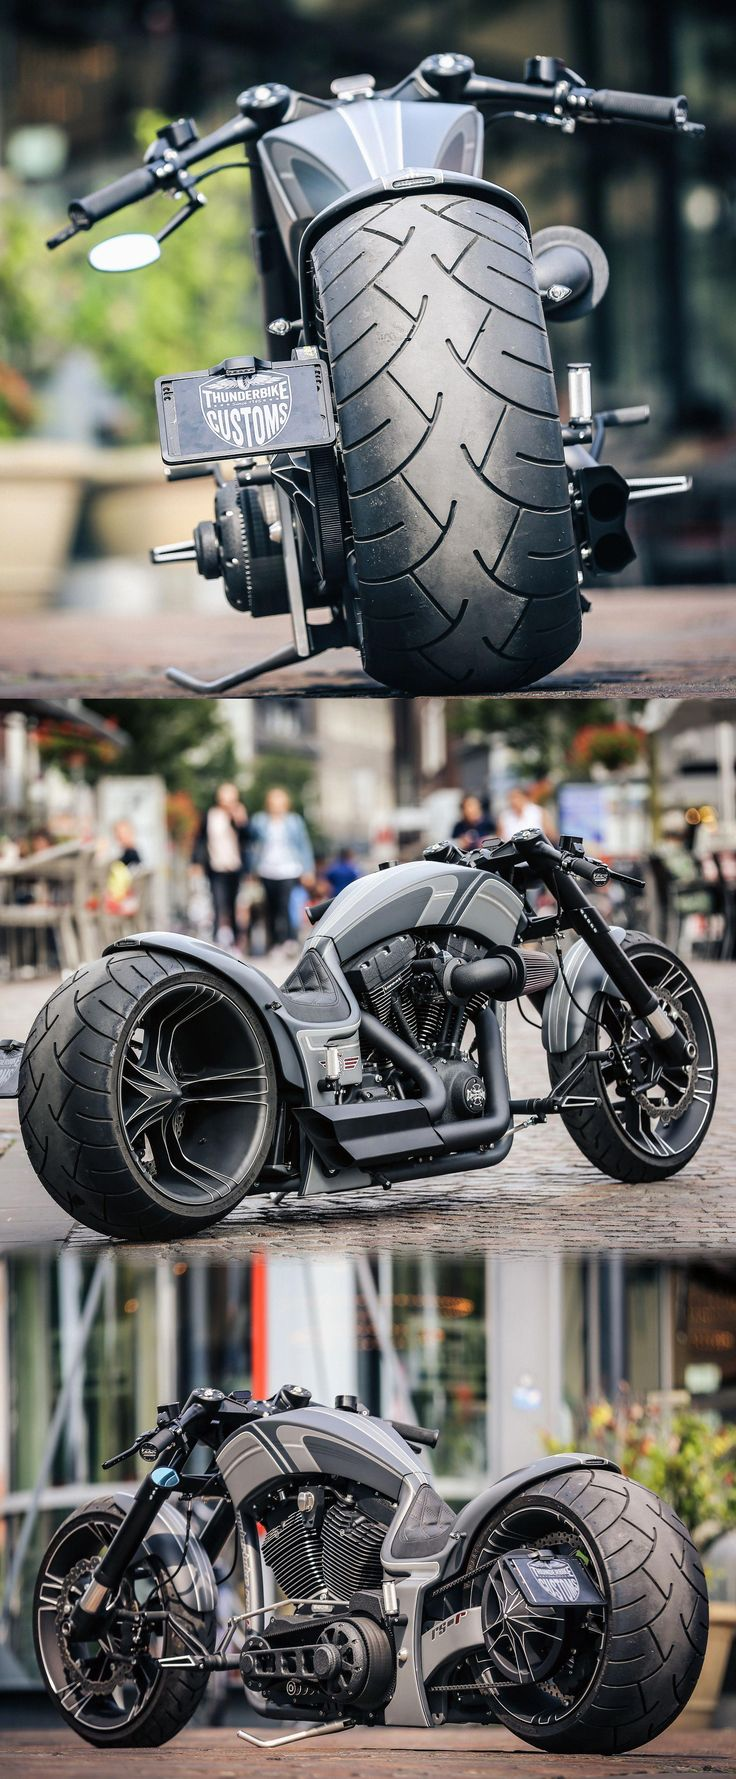 BEST COOPHER MOTORCYCLES pinterest.com/mrcafer #HarleyDavidsonCustomBikes